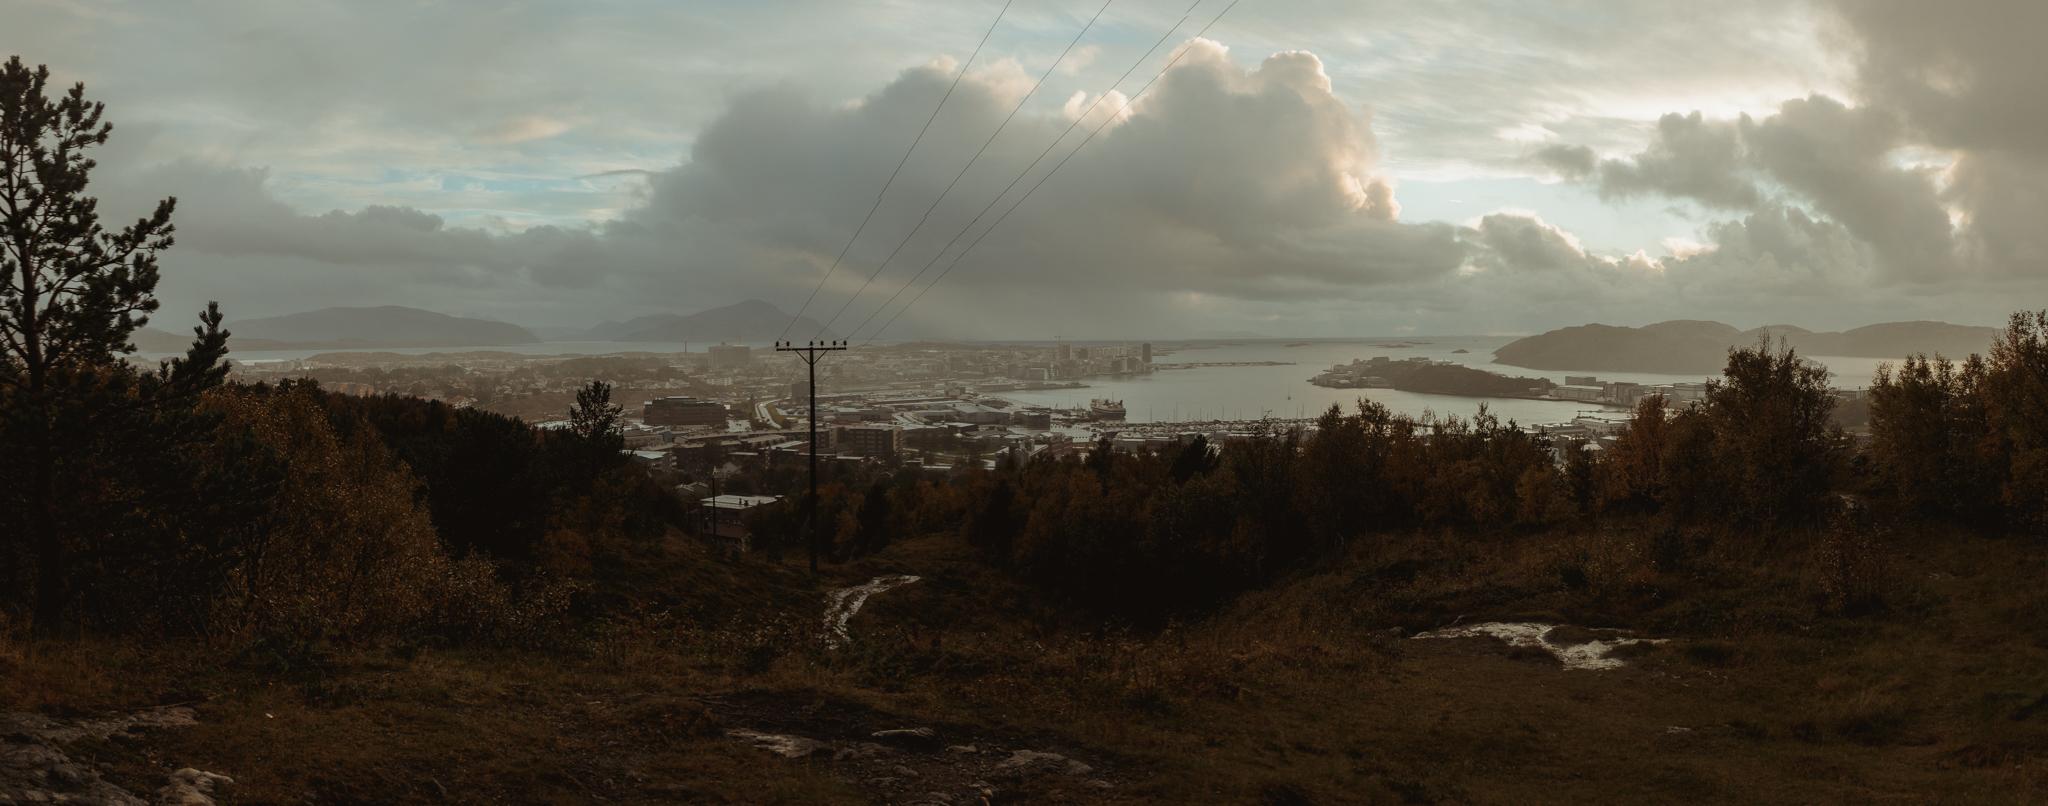 Panorámica del puerto de   Bodø  .